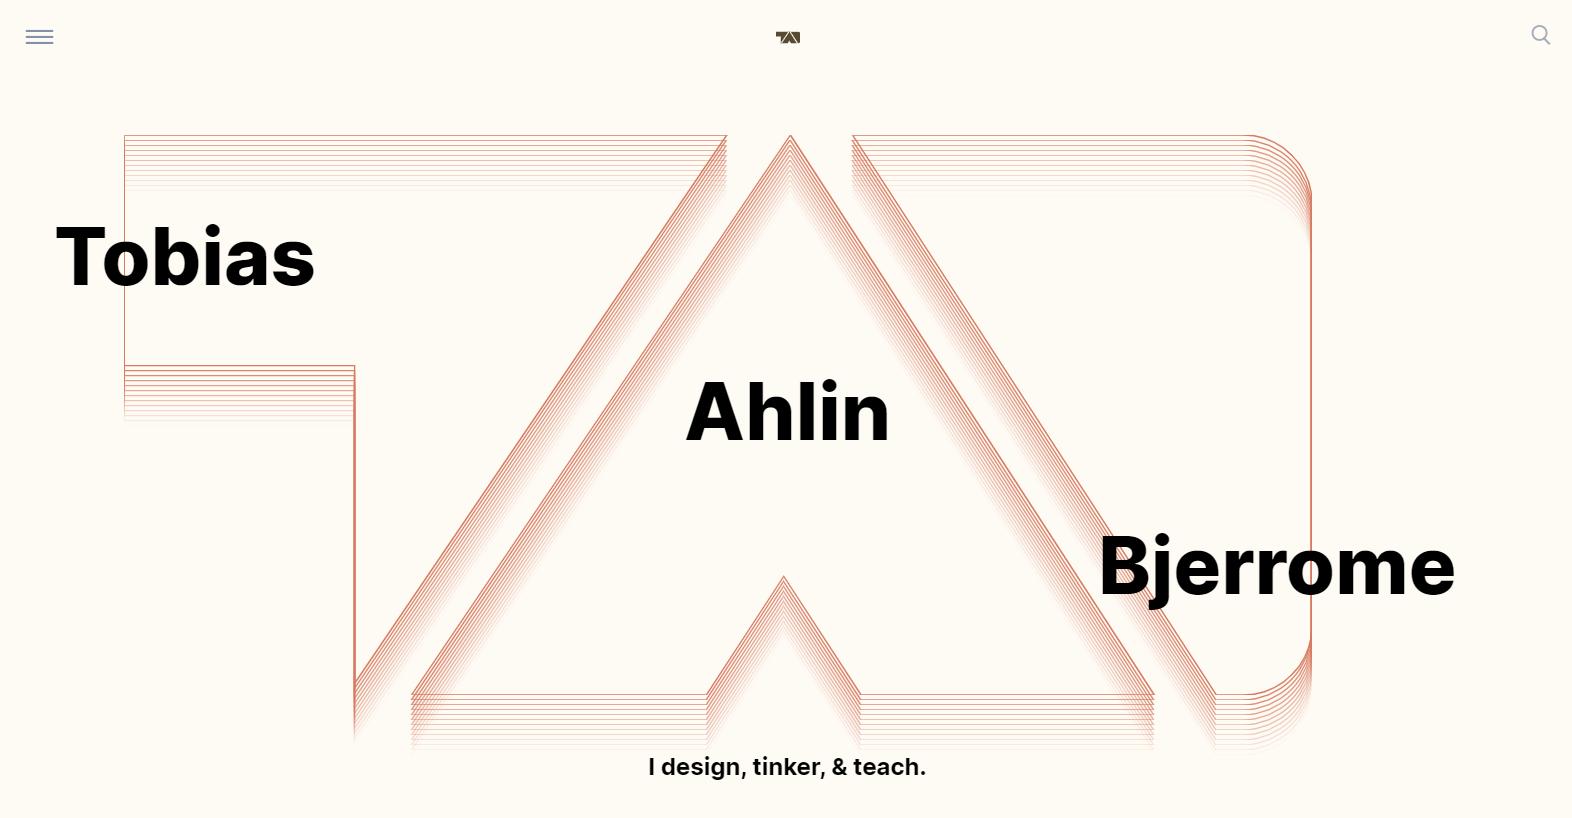 Tobias Aglin's personal website